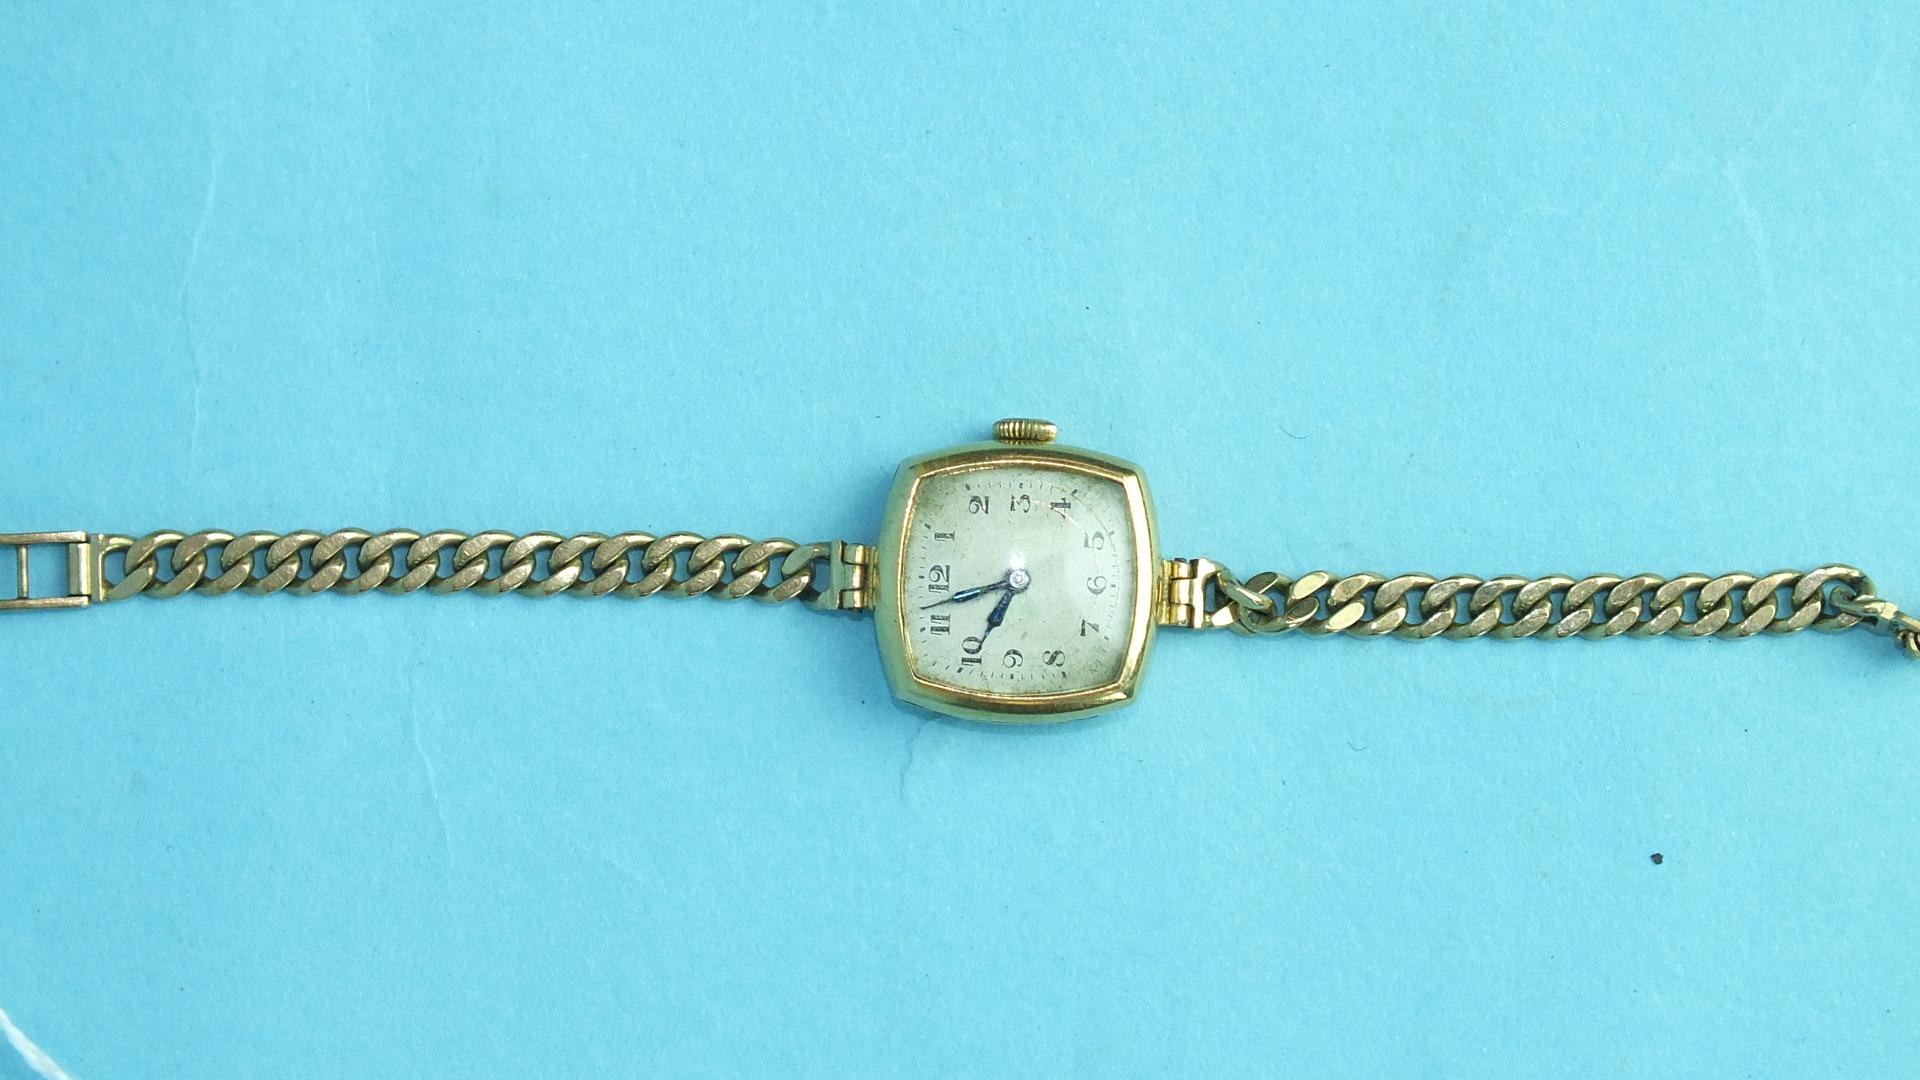 Lot 153 - A ladies 18ct-gold-cased Centaur wrist watch on 9ct gold curb-link bracelet.